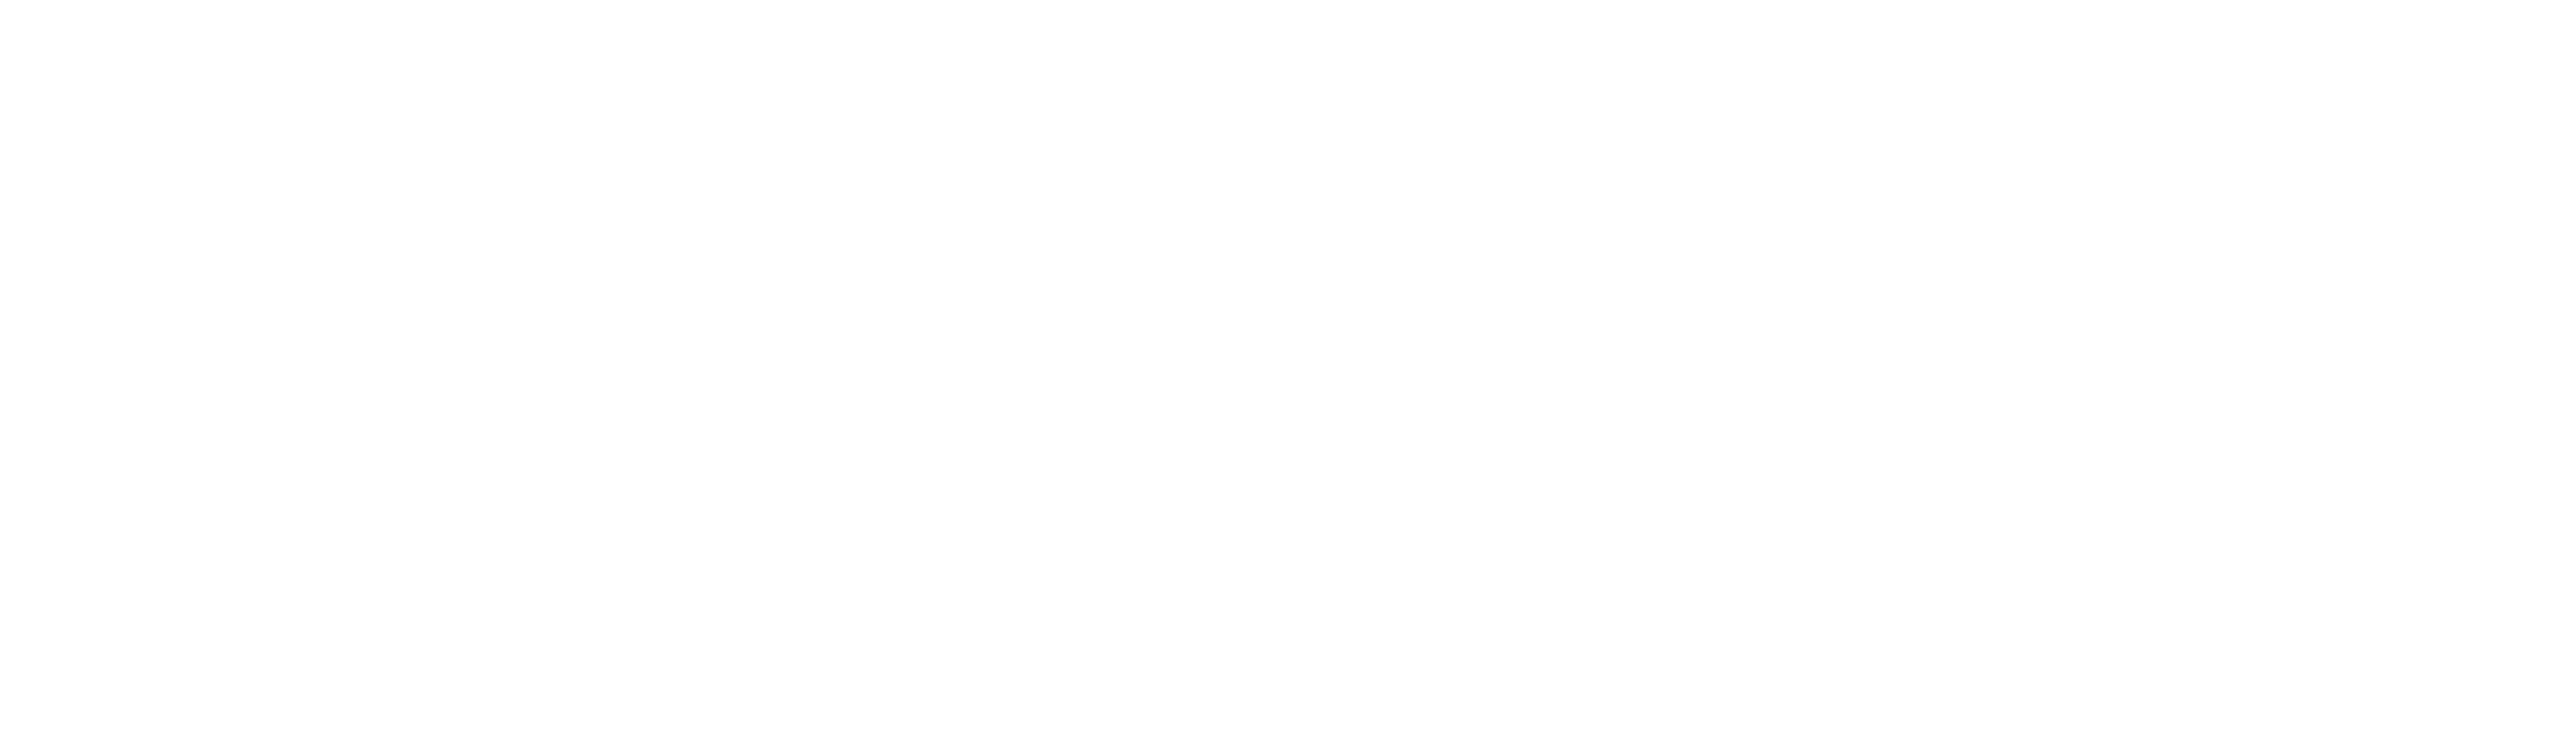 Festival de Cannes 3. - White